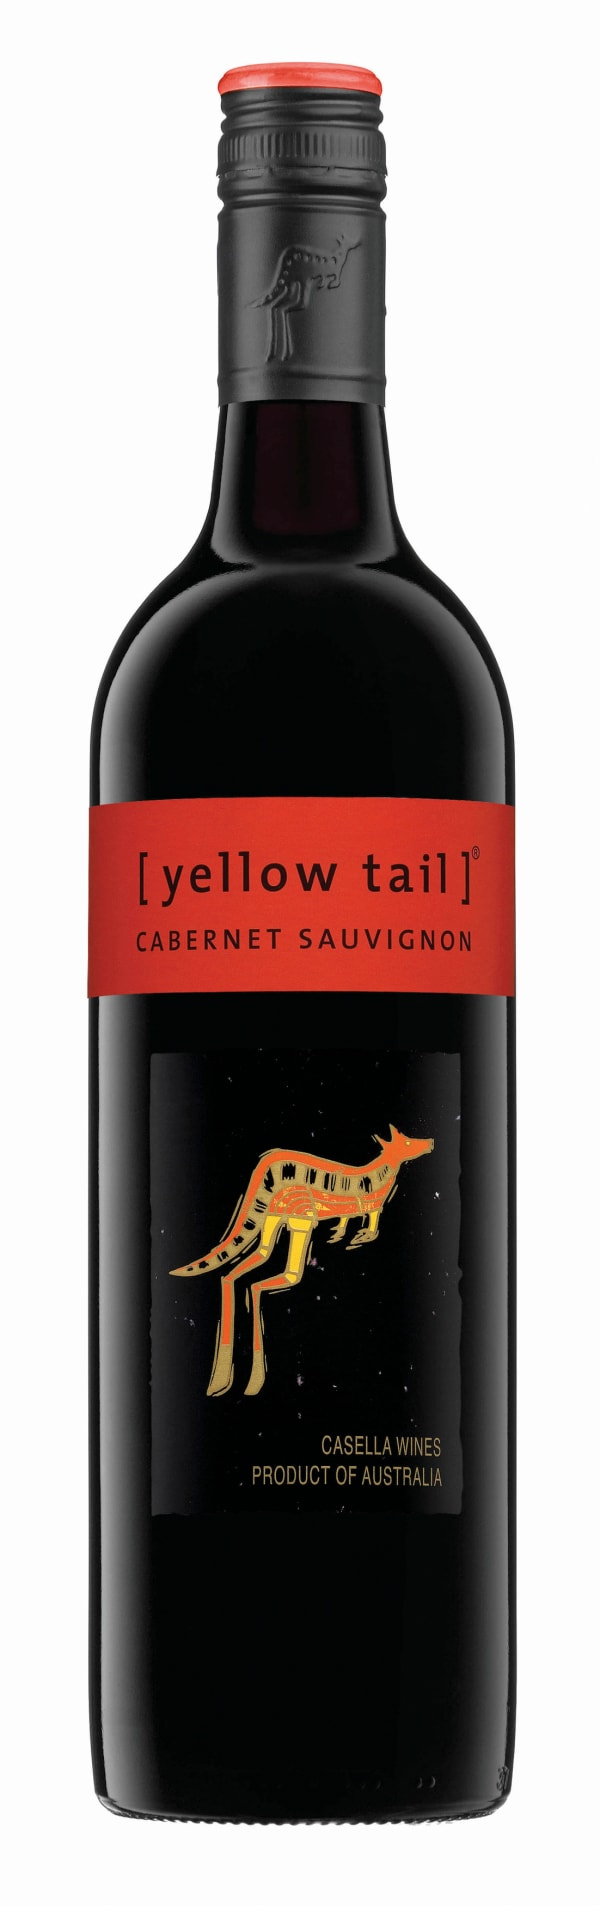 Yellow Tail Cabernet Sauvignon 2020